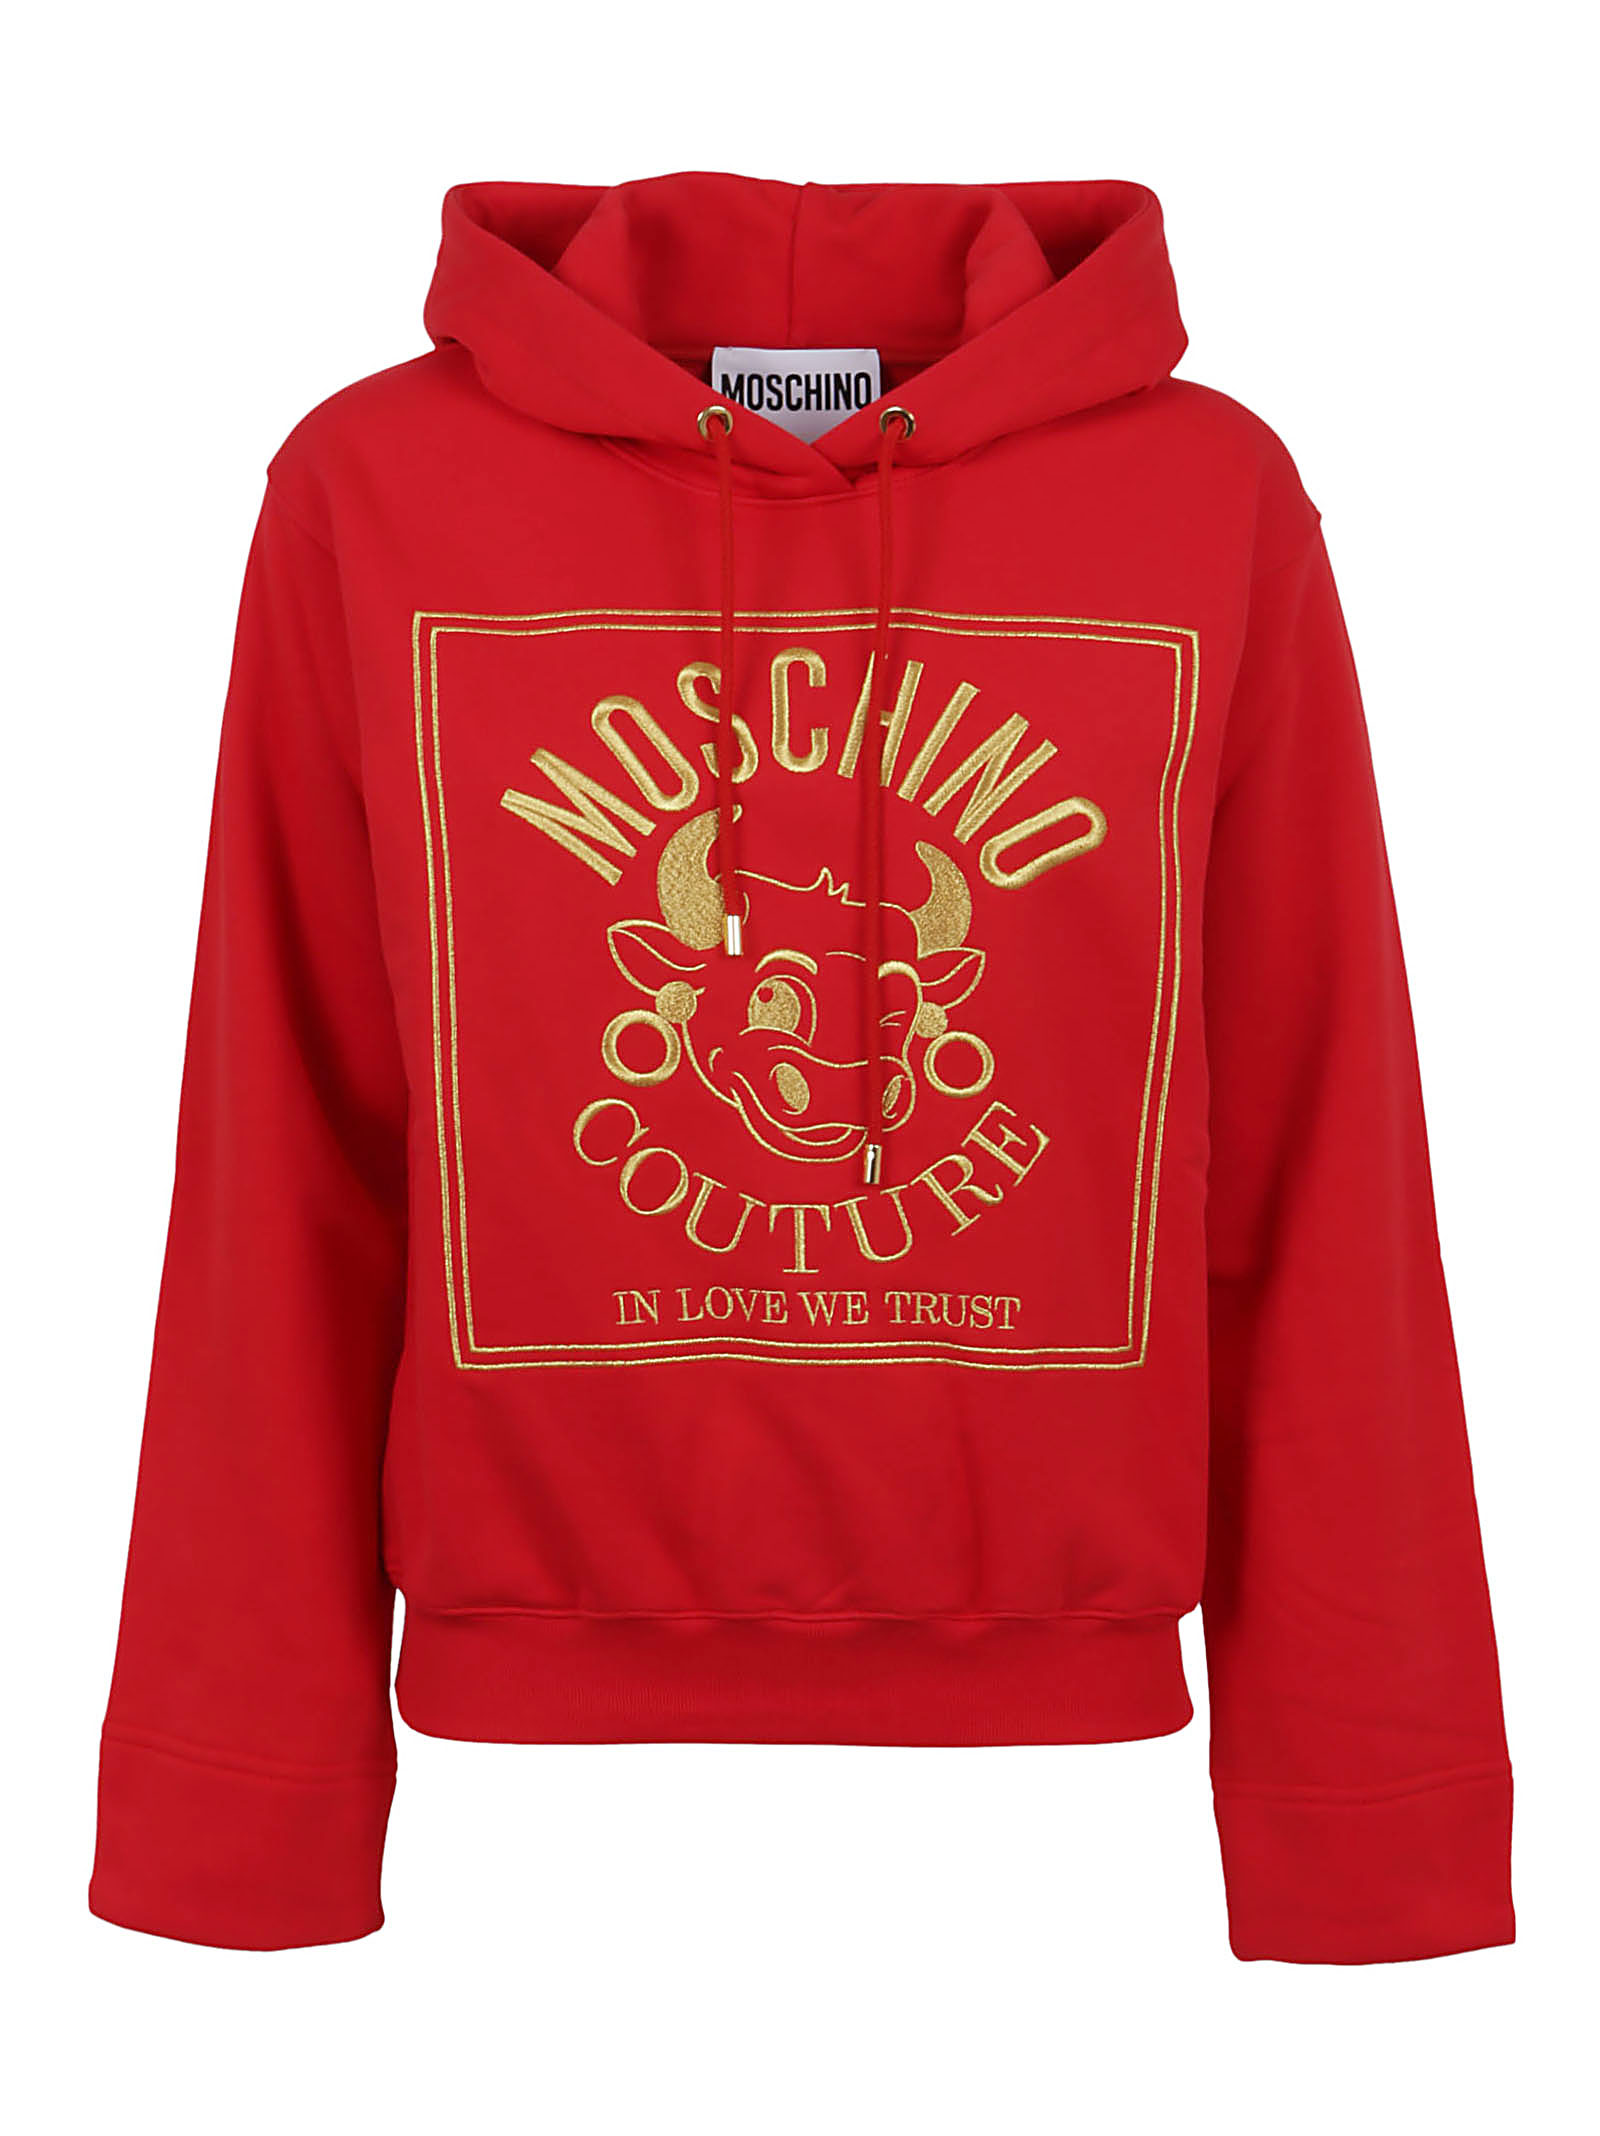 Moschino In Love We Trust Hooded Sweatshirt